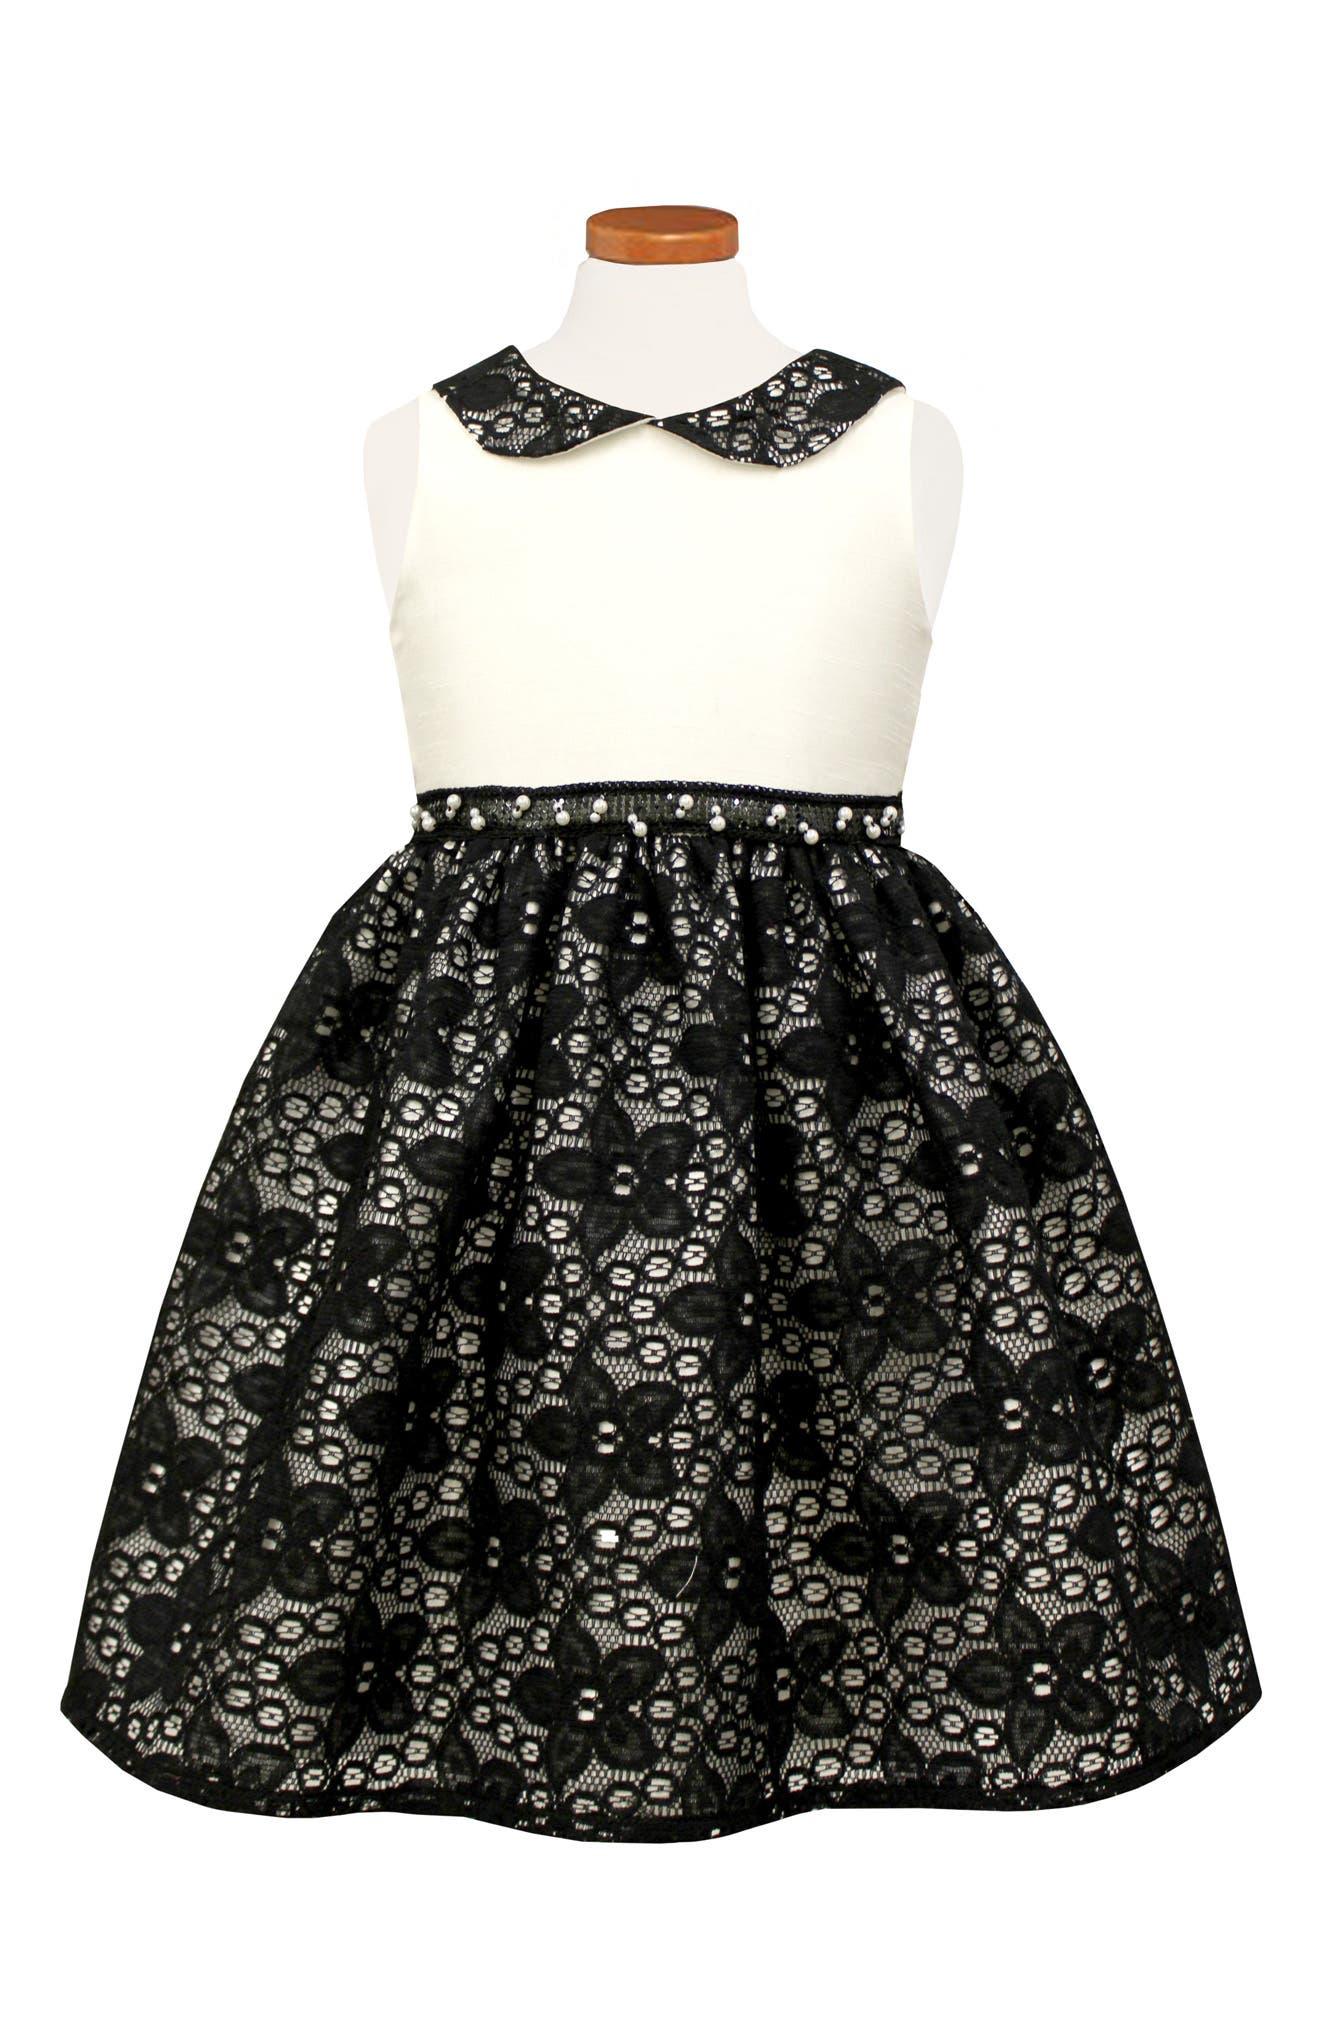 Main Image - Sorbet Peter Pan Collar Party Dress (Toddler Girls & Little Girls)